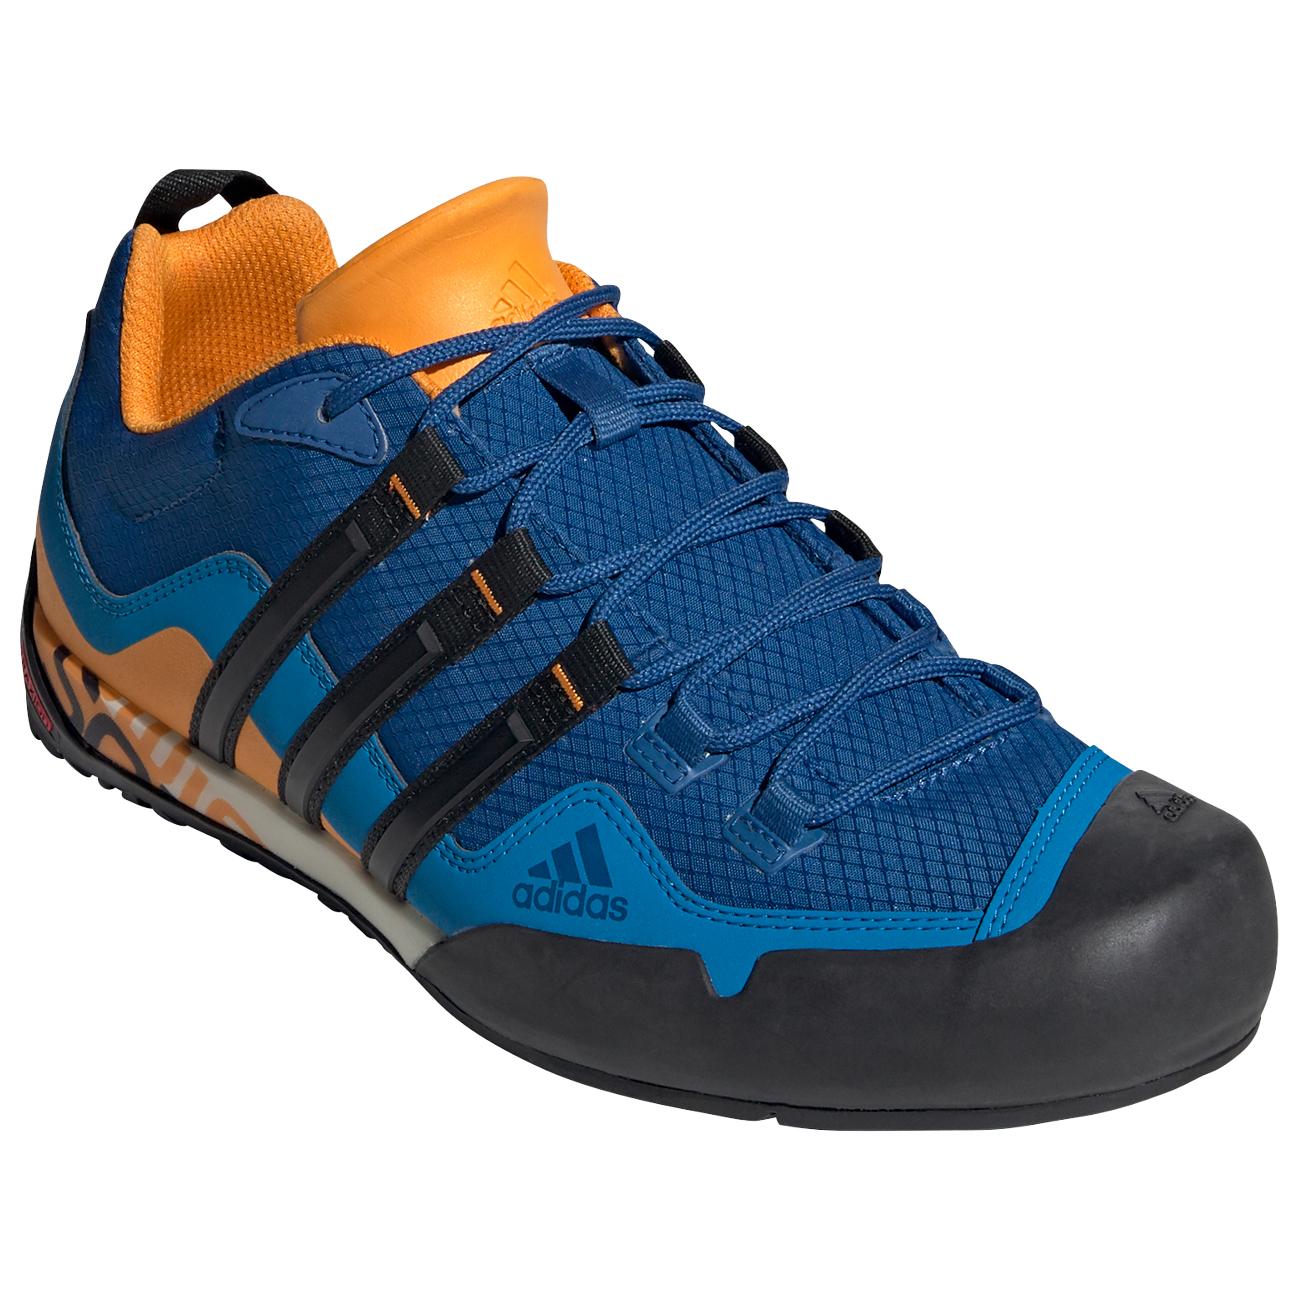 Adidas Terrex Swift Solo - Chaussures d'approche | Livraison ...